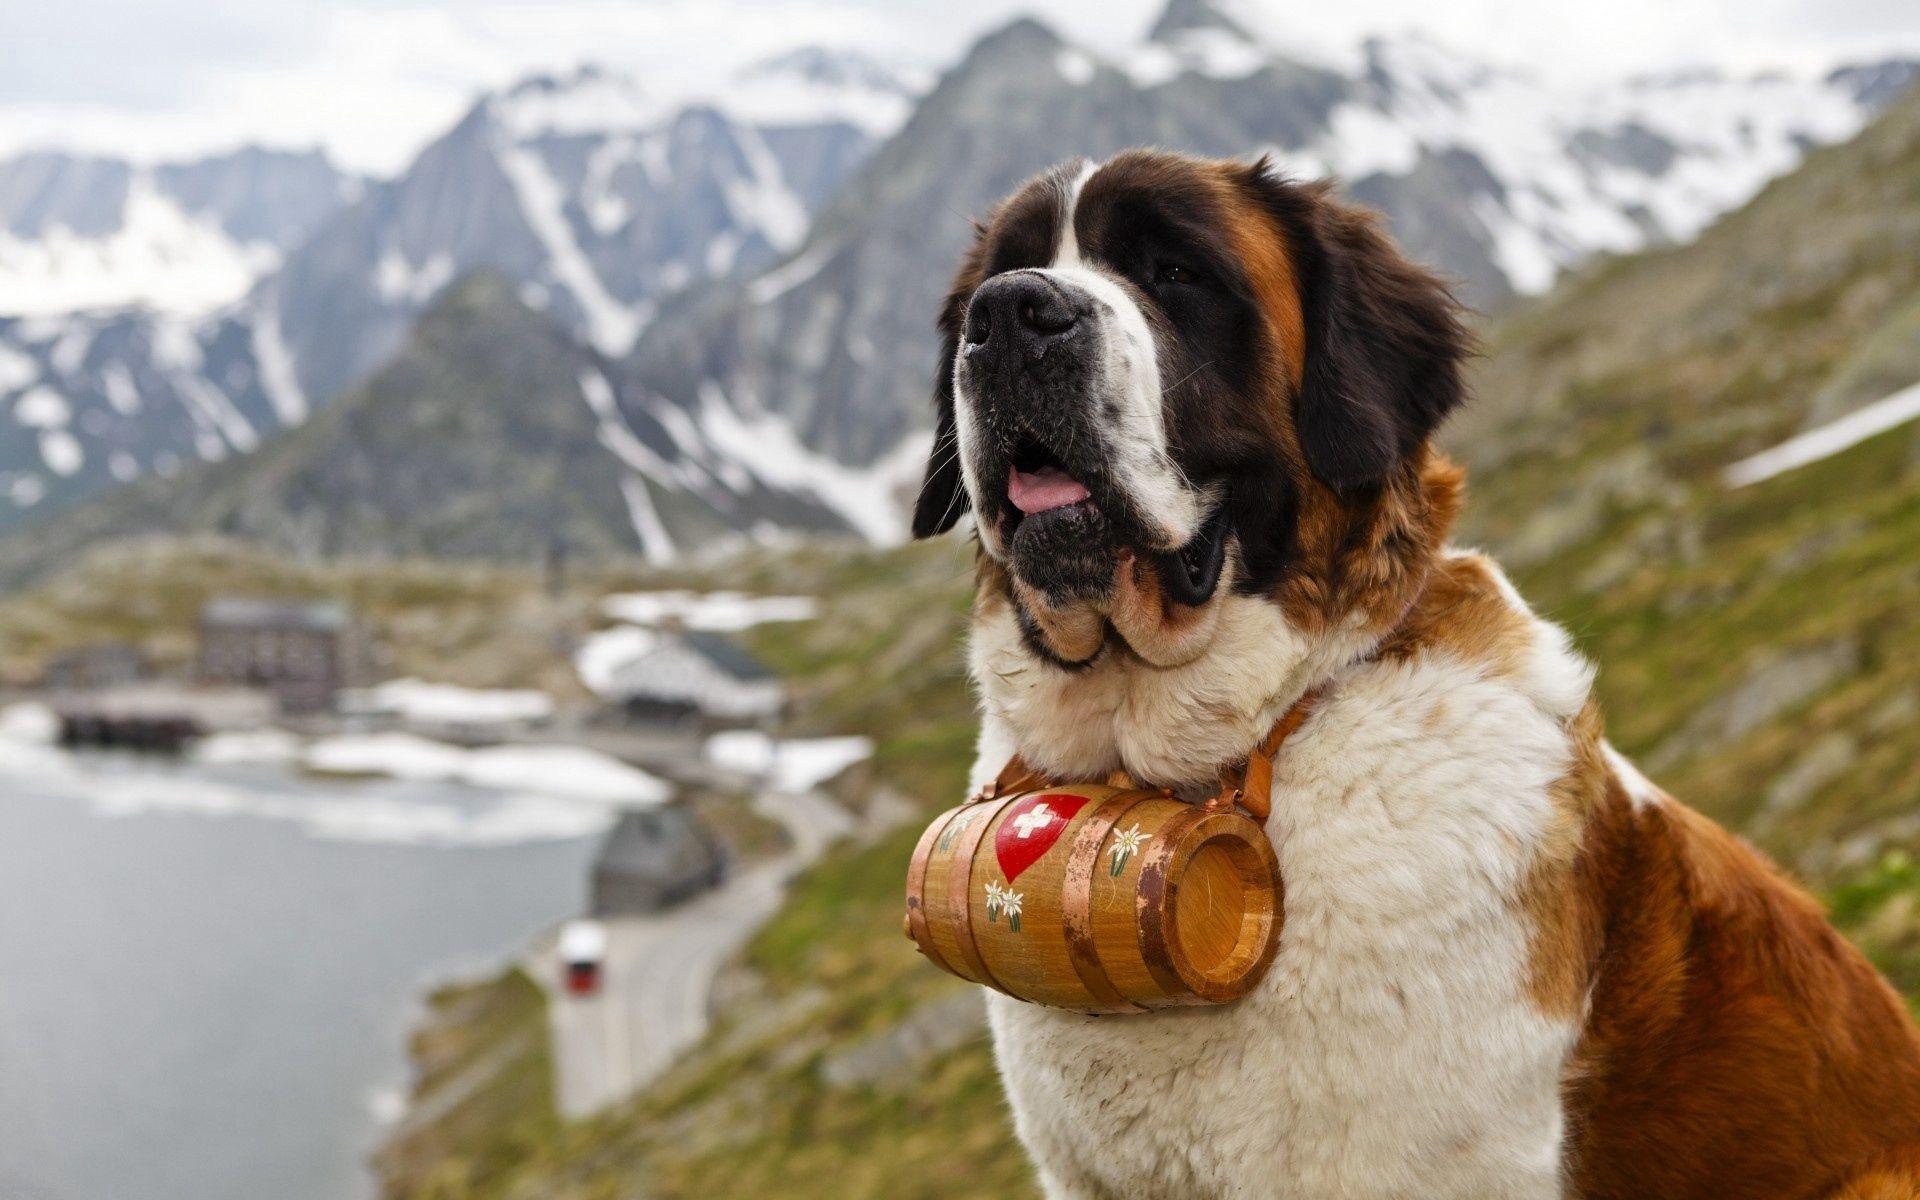 143944 Screensavers and Wallpapers Dog for phone. Download Animals, St. Bernard, Saint Bernard, Dog, Muzzle, Barrel, Cask pictures for free